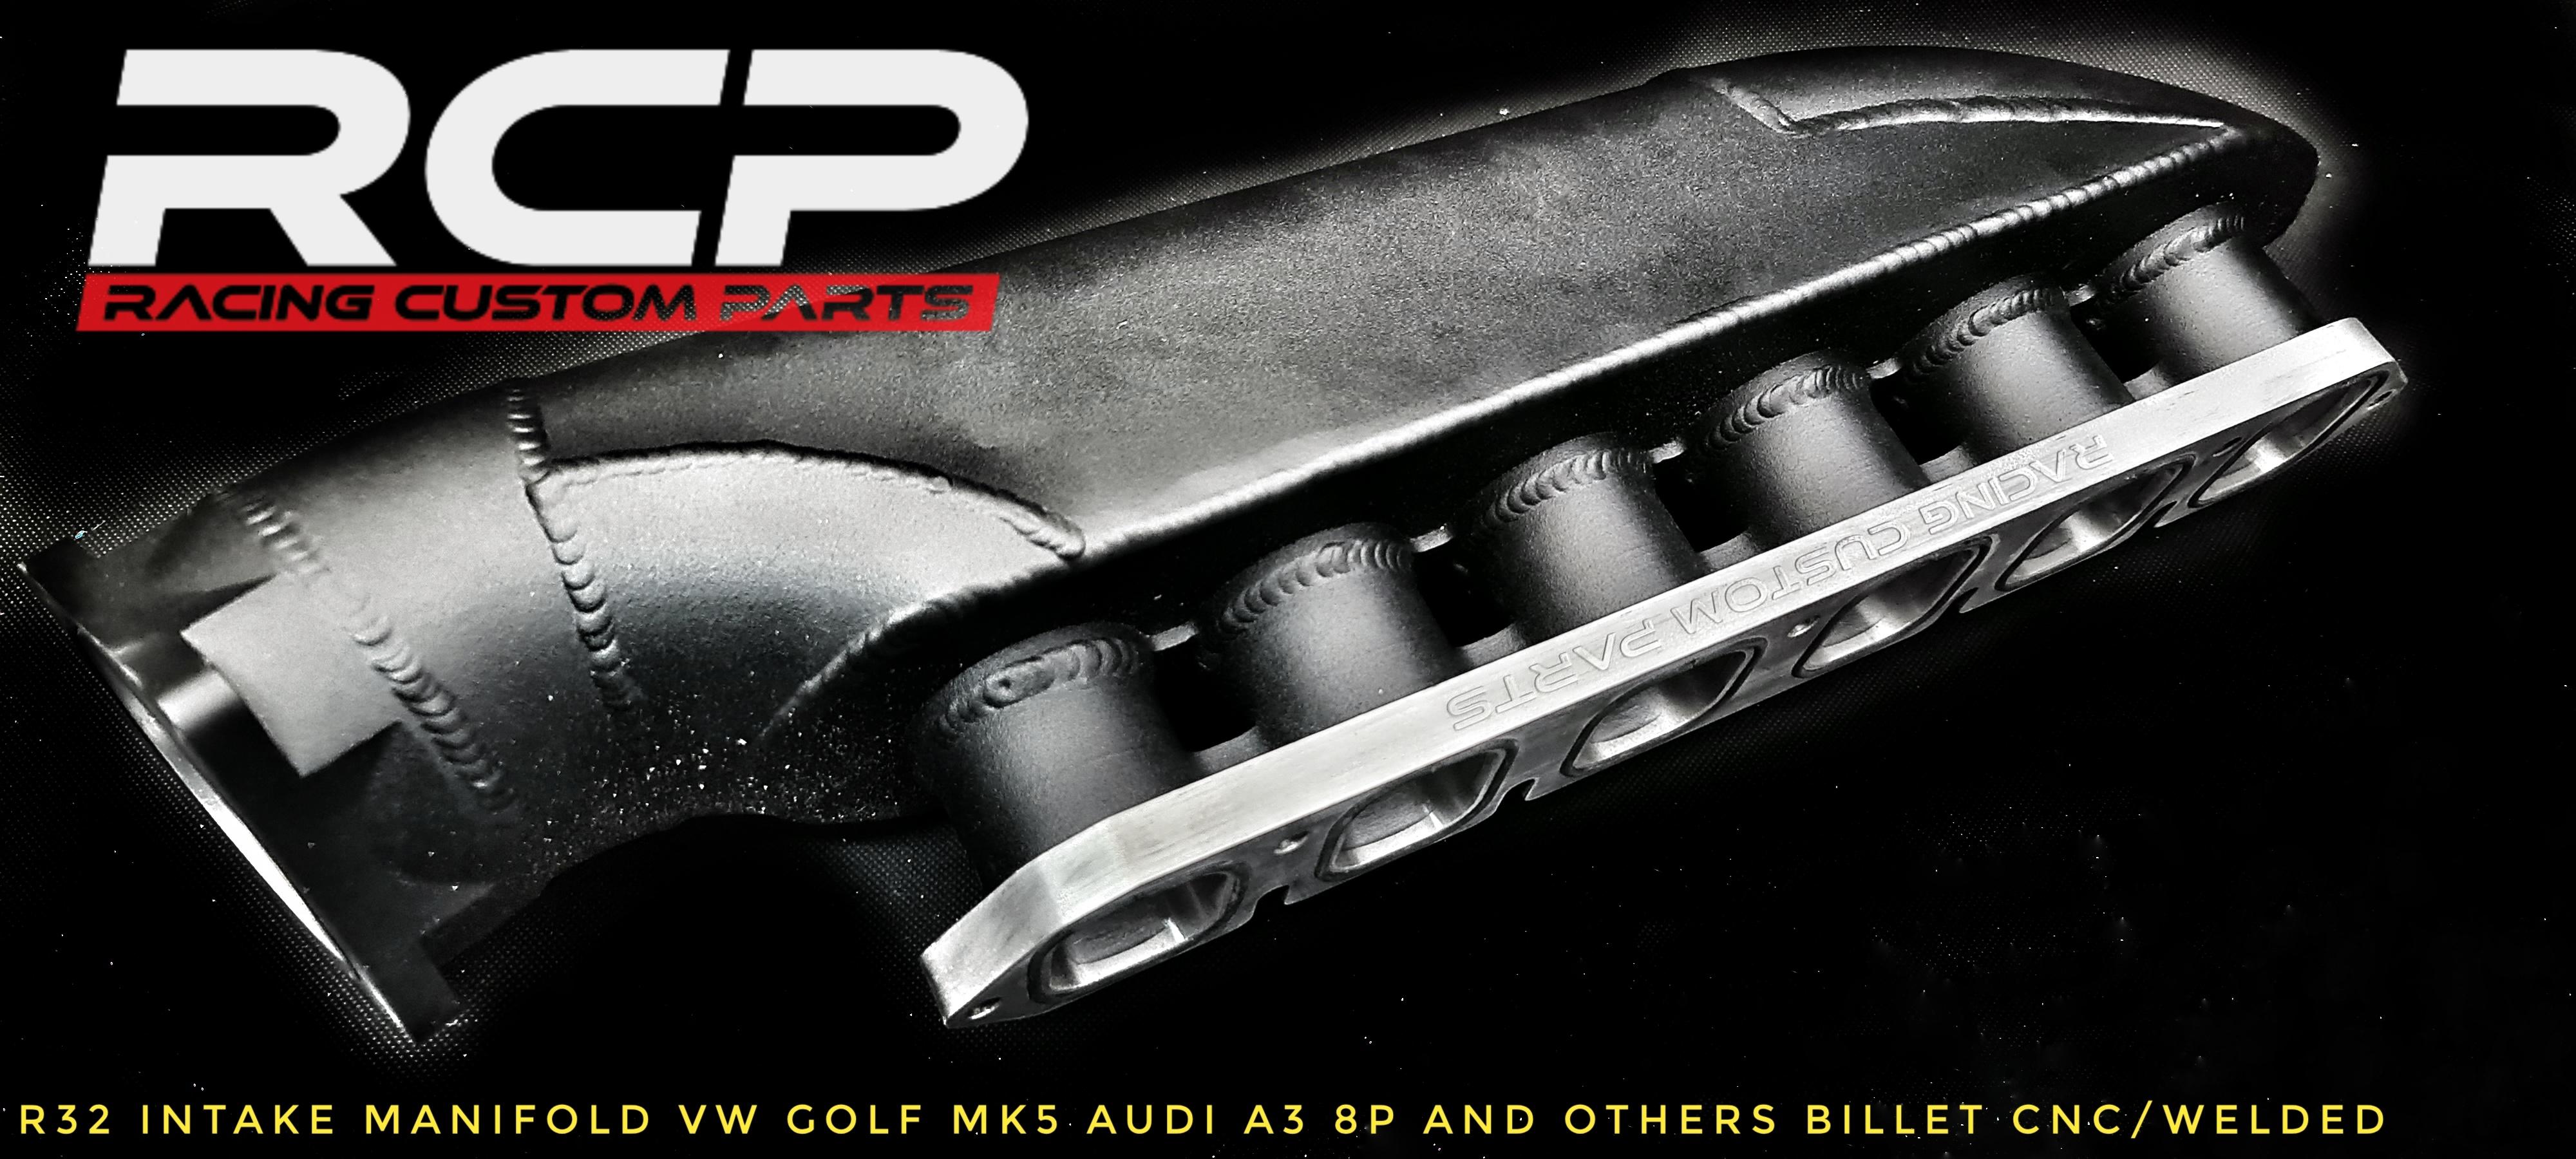 r32 custom intake manifold welde billet cnc golf 5 audi a3 turbo r30 rcp racing custom parts